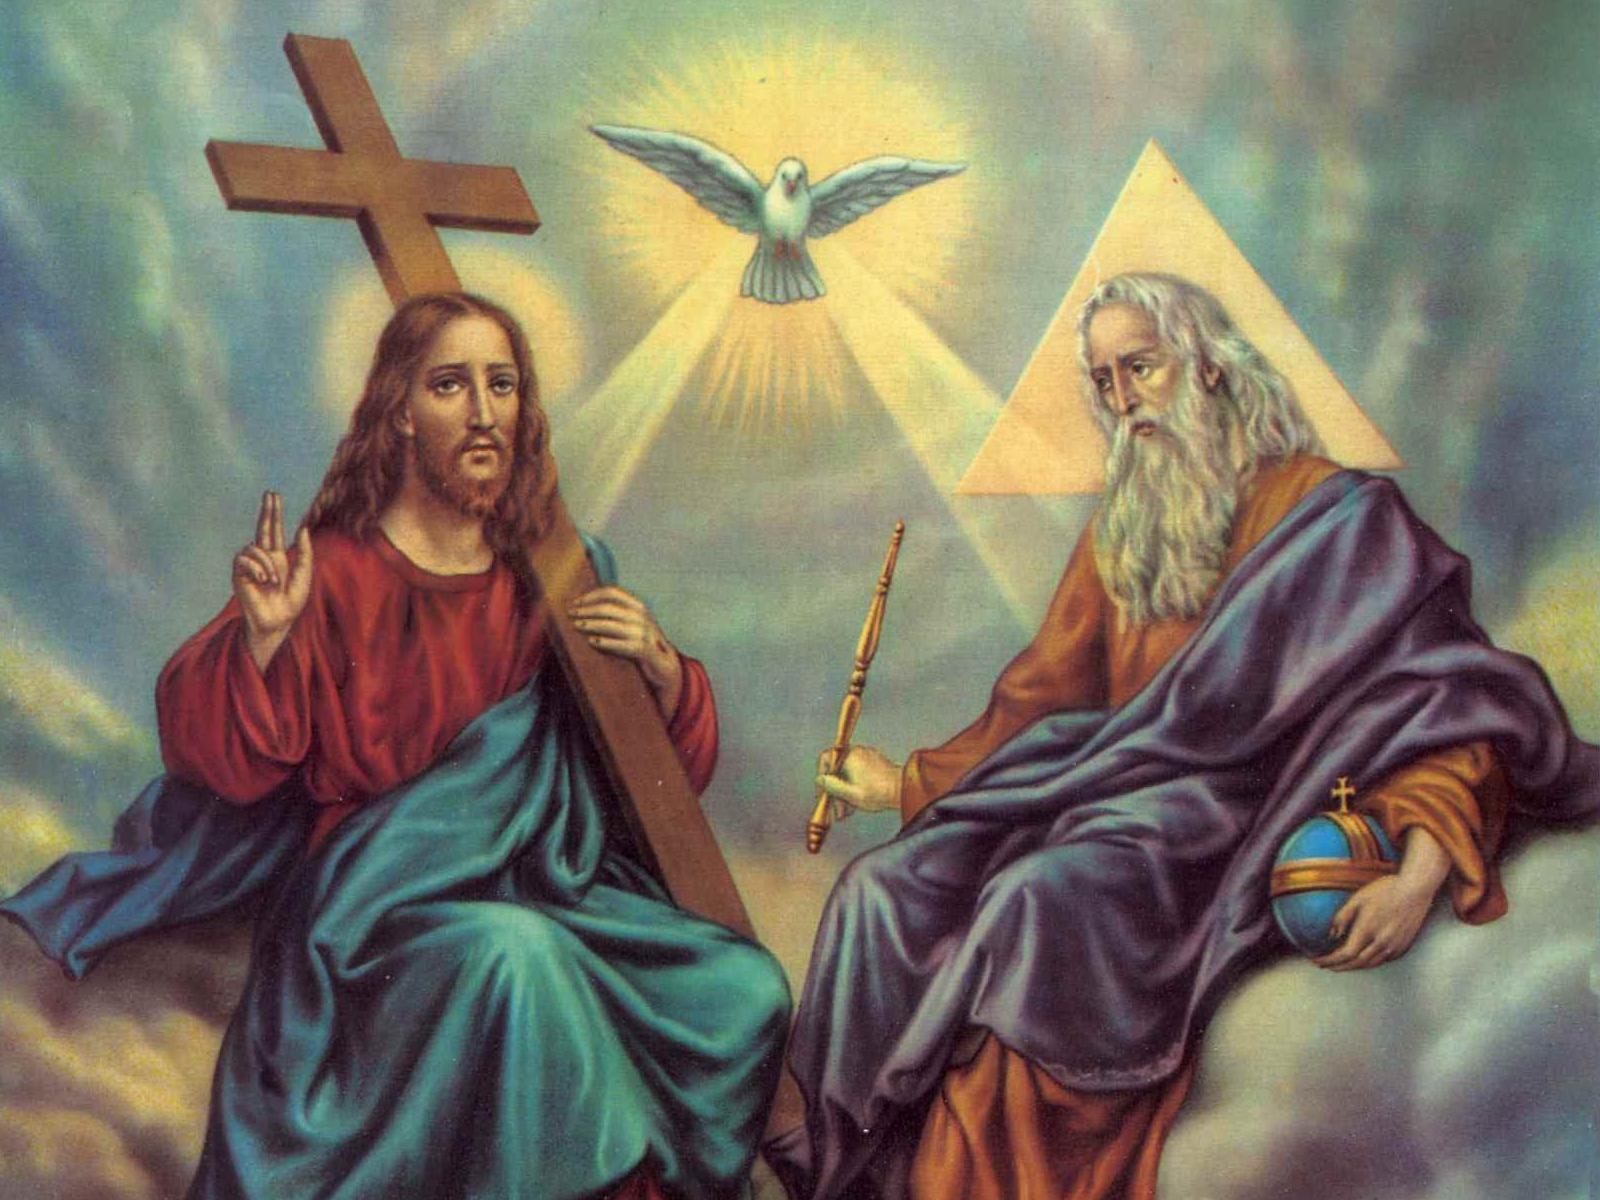 http://3.bp.blogspot.com/-IMa6YIAQpHs/UNRuWmrVRSI/AAAAAAAADlM/h-okukBp7i4/s1600/Blessed_Trinity_One_God_Wallpaper_1600x1200_wallpaperhere.JPG